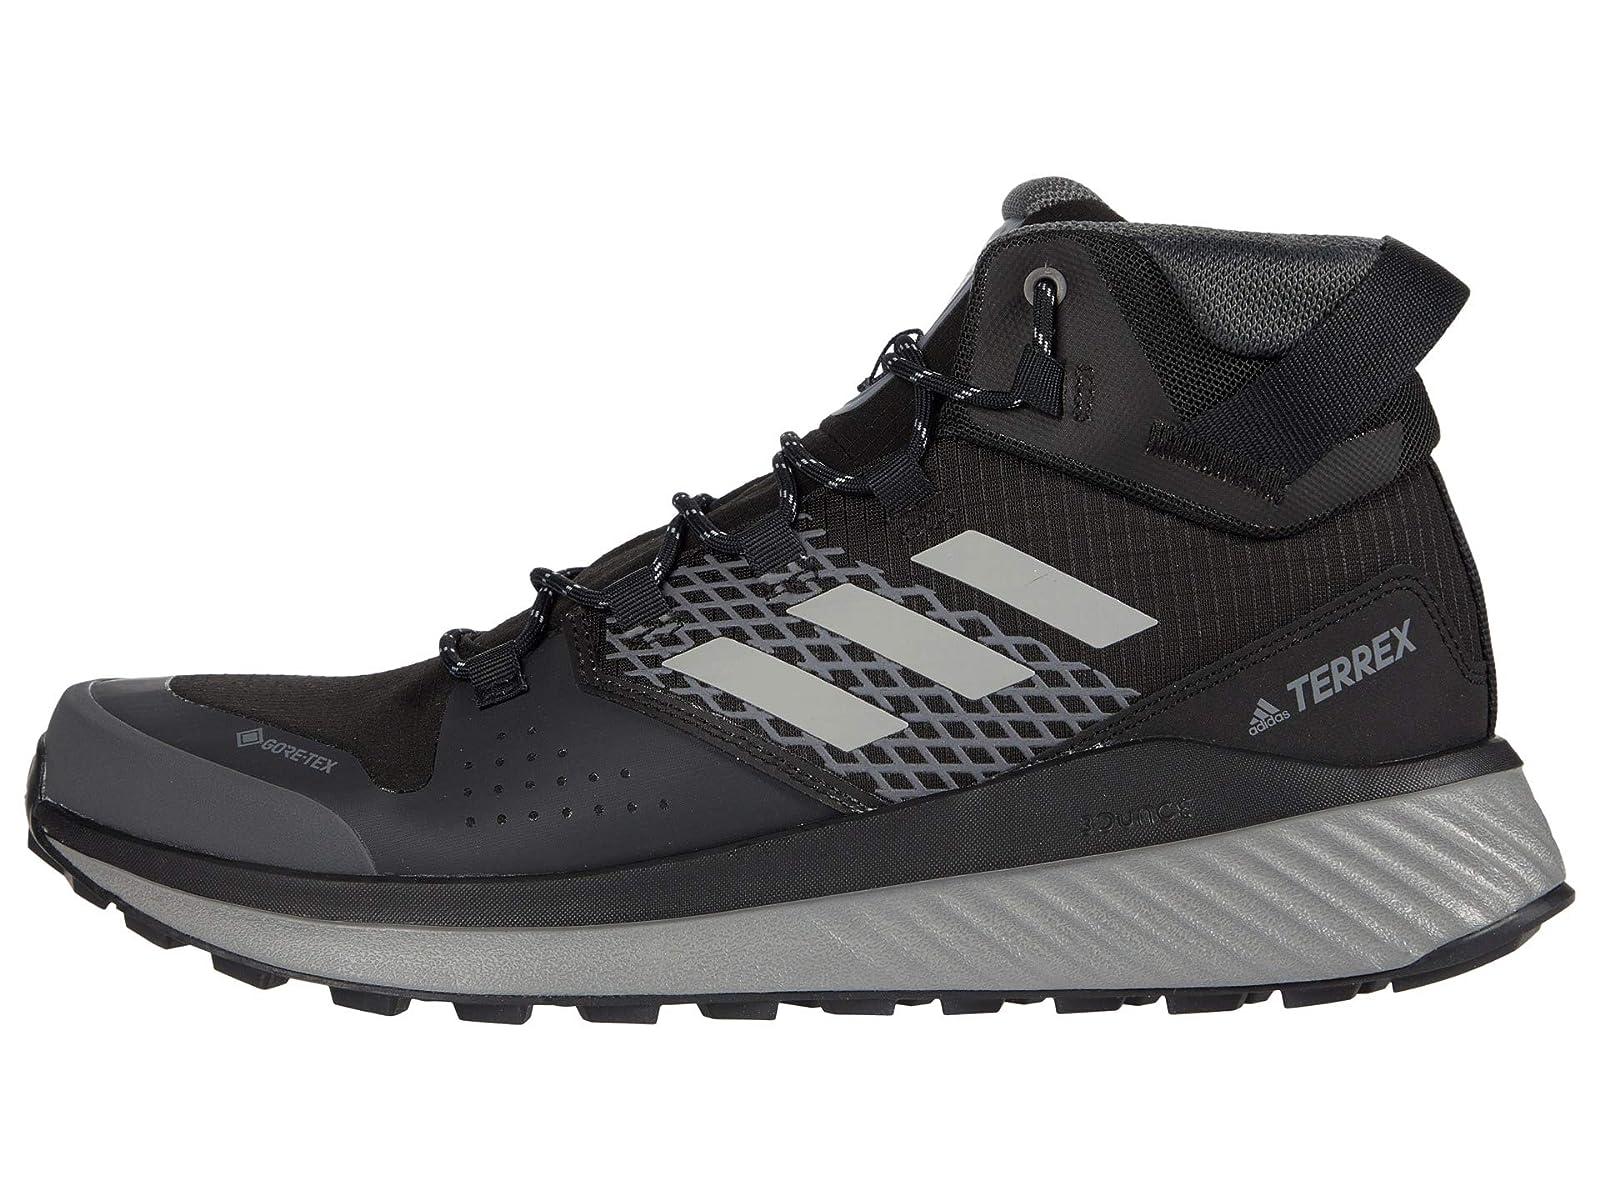 Mannes-Schuhe-Adidas-Outdoor-TERREX-folgian-Hiker-Mid-GTX Indexbild 5